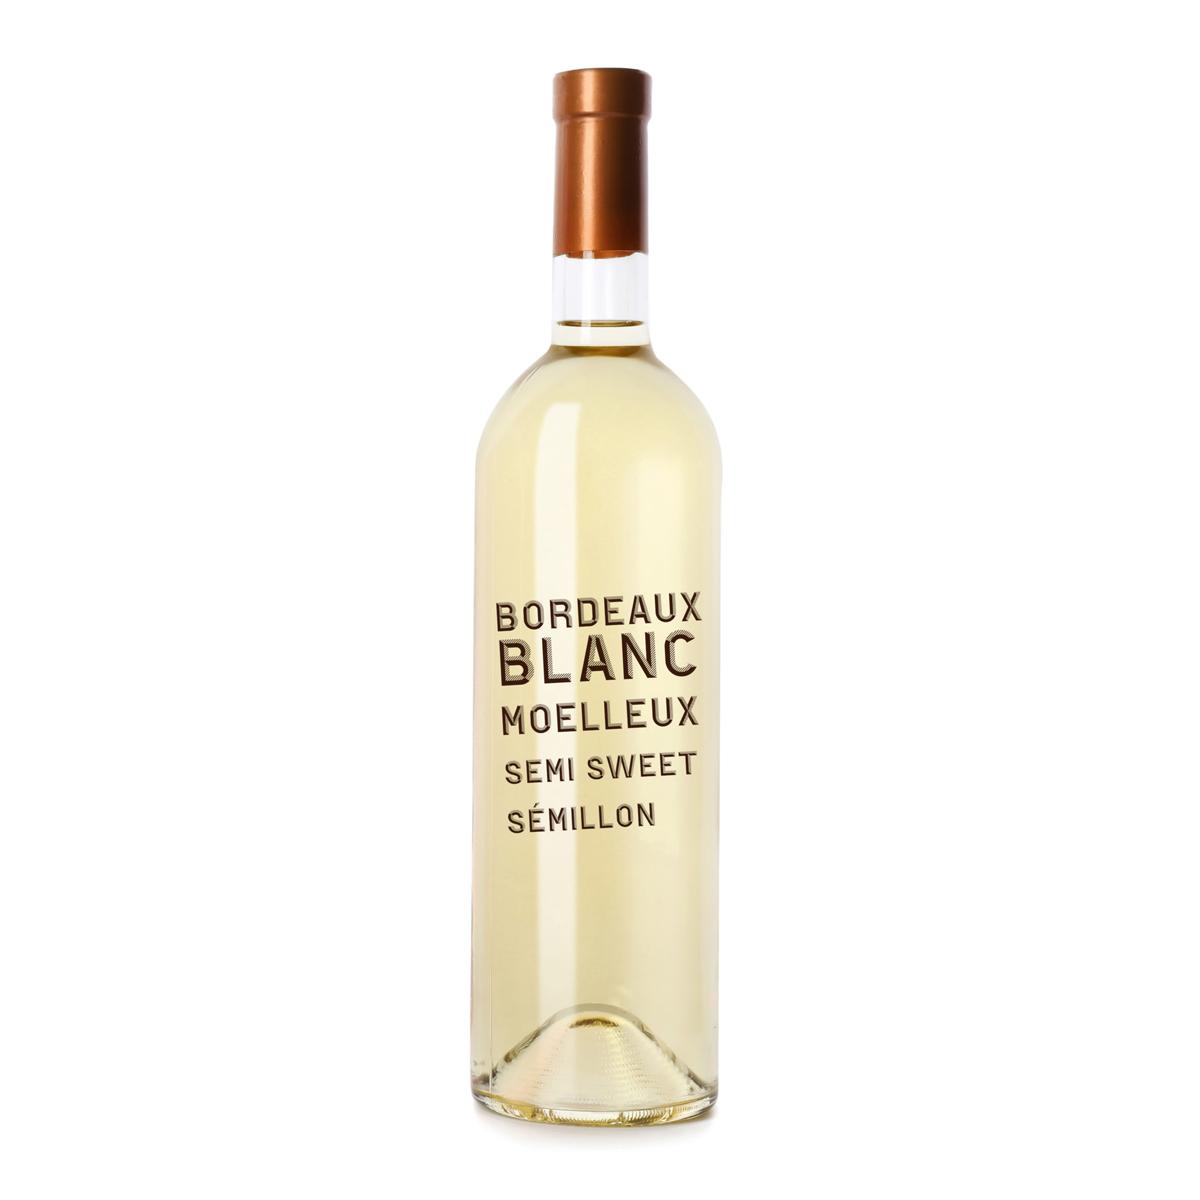 法国AOC Bordeaux semi sweet white